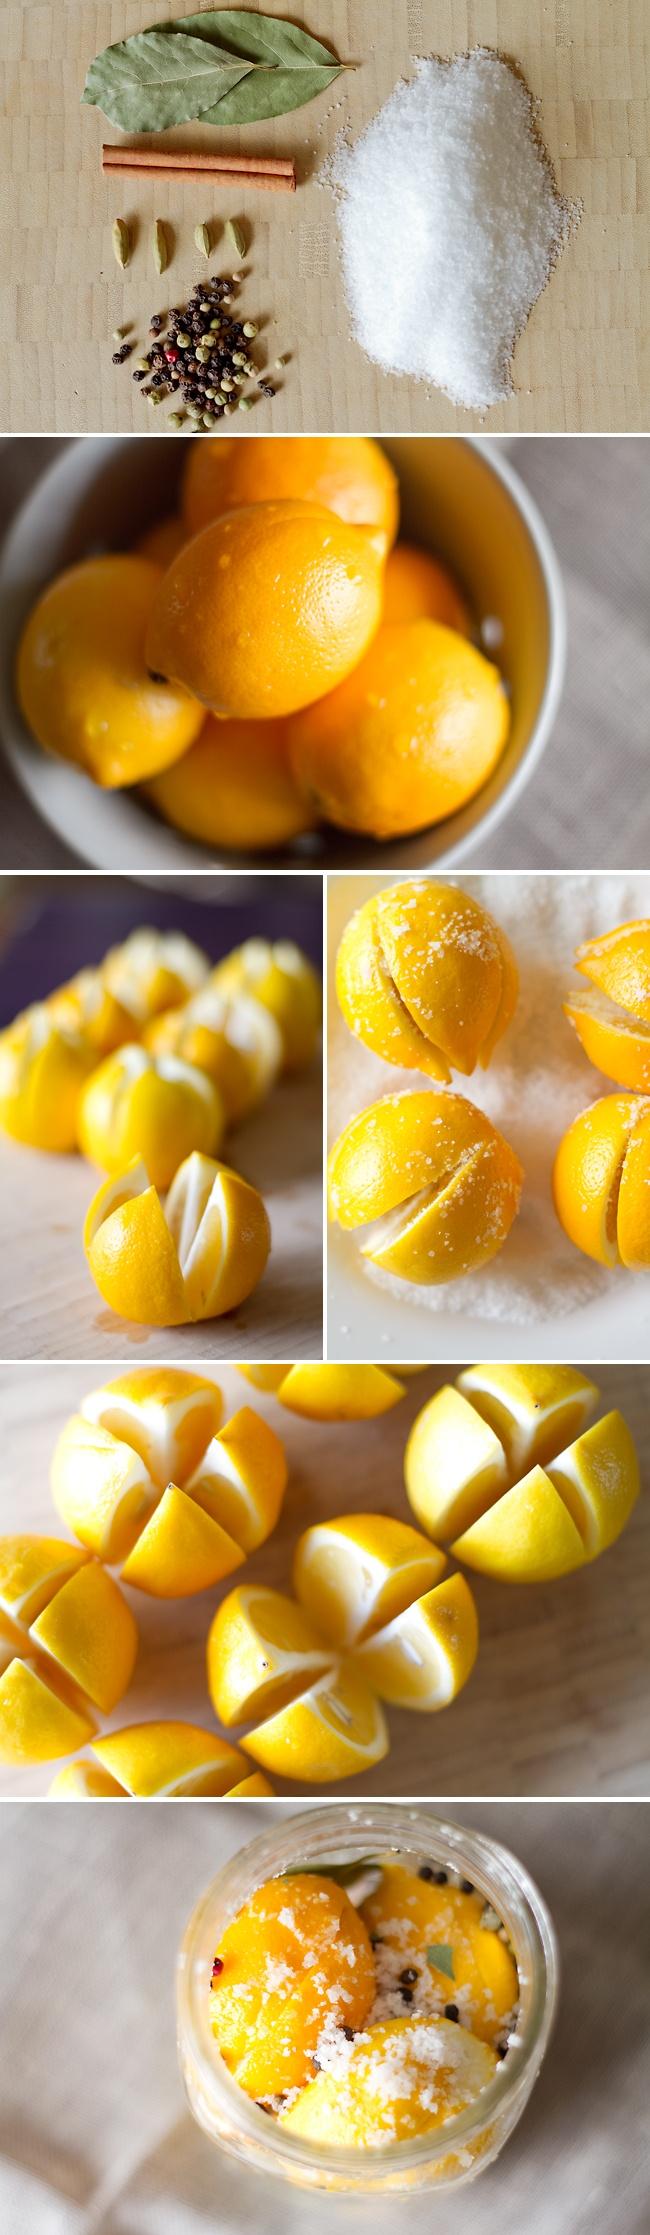 conserva marroqui de limon  moroccan lemons